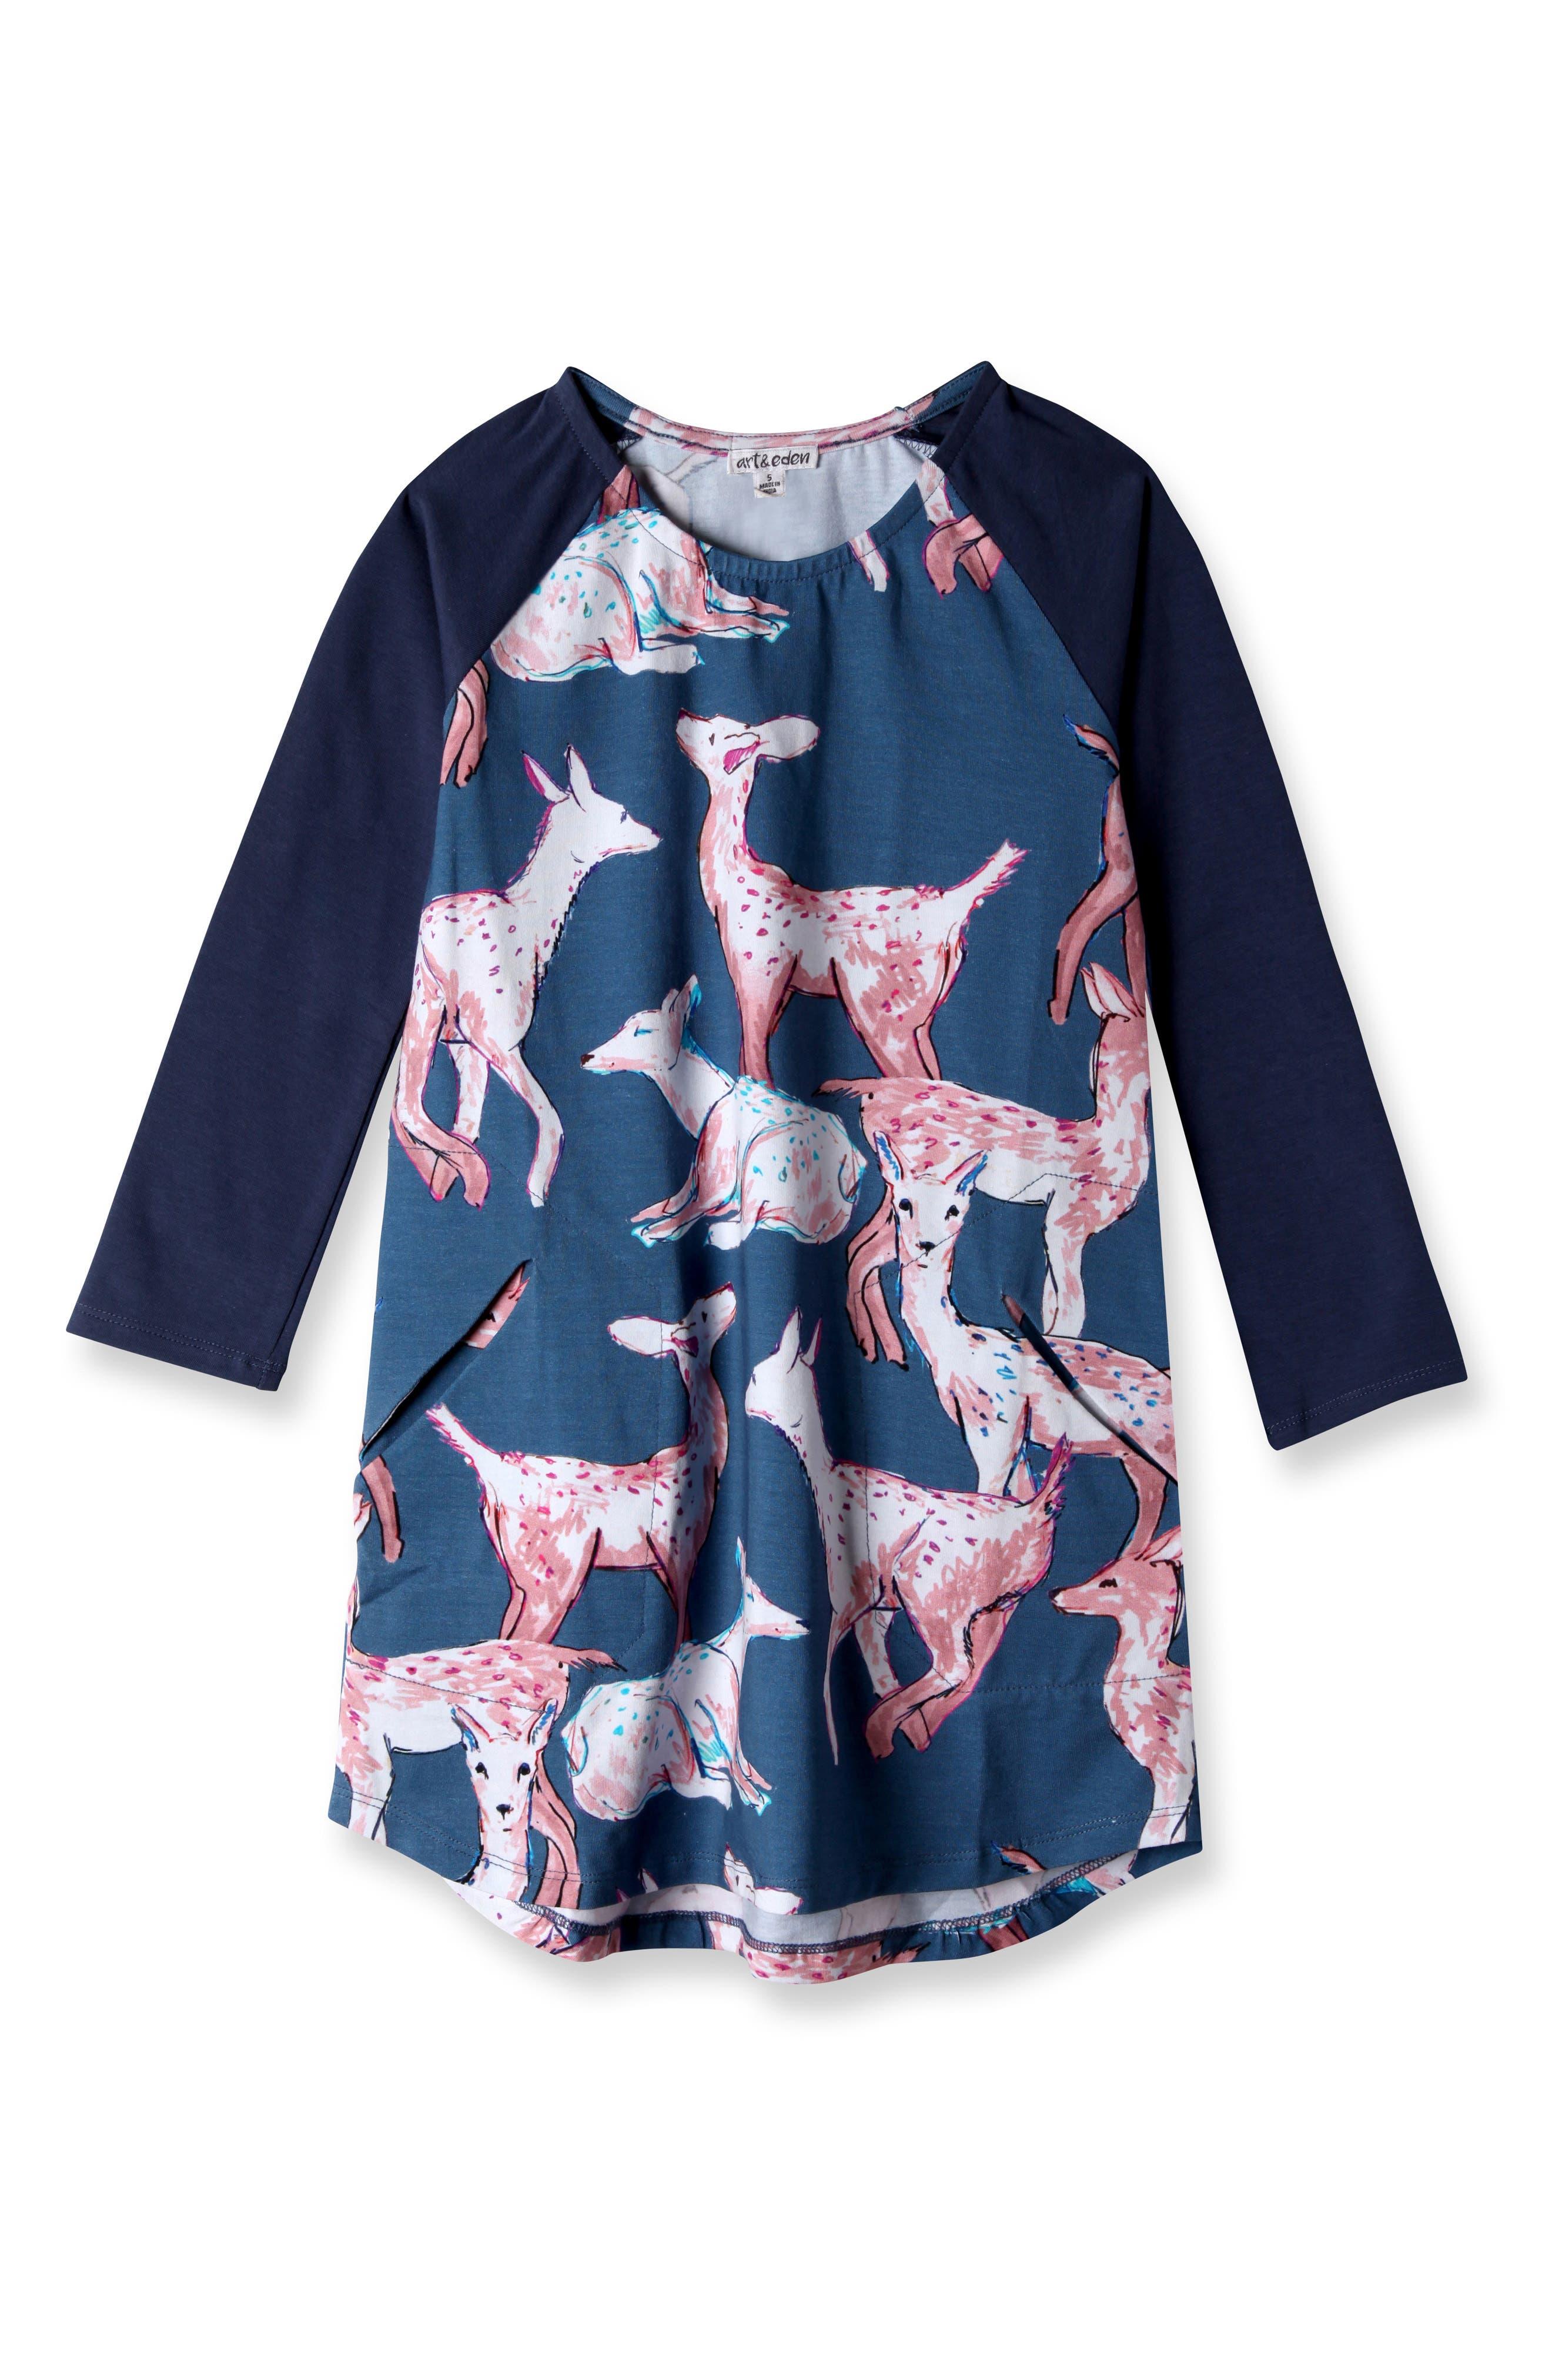 Alternate Image 1 Selected - Art & Eden Luna Dress (Toddler Girls & Little Girls)